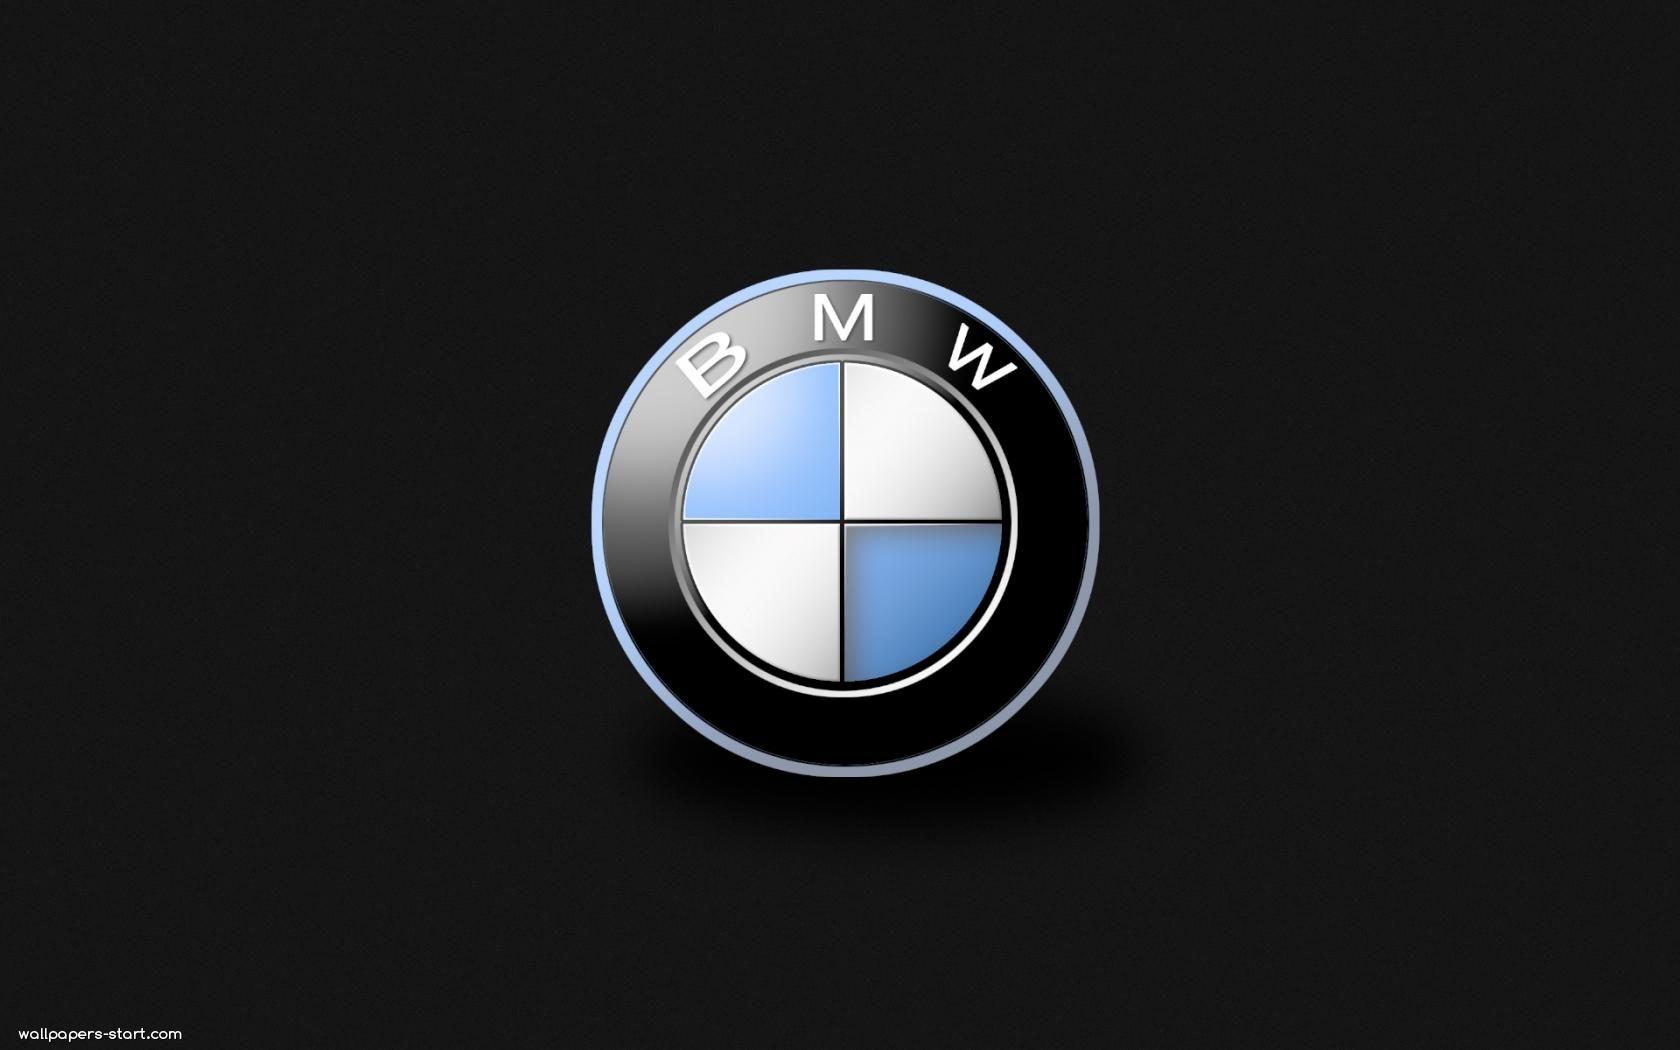 Bmw Pinterest Pin Bmw Logo Wallpaper Cars Wallpapers On